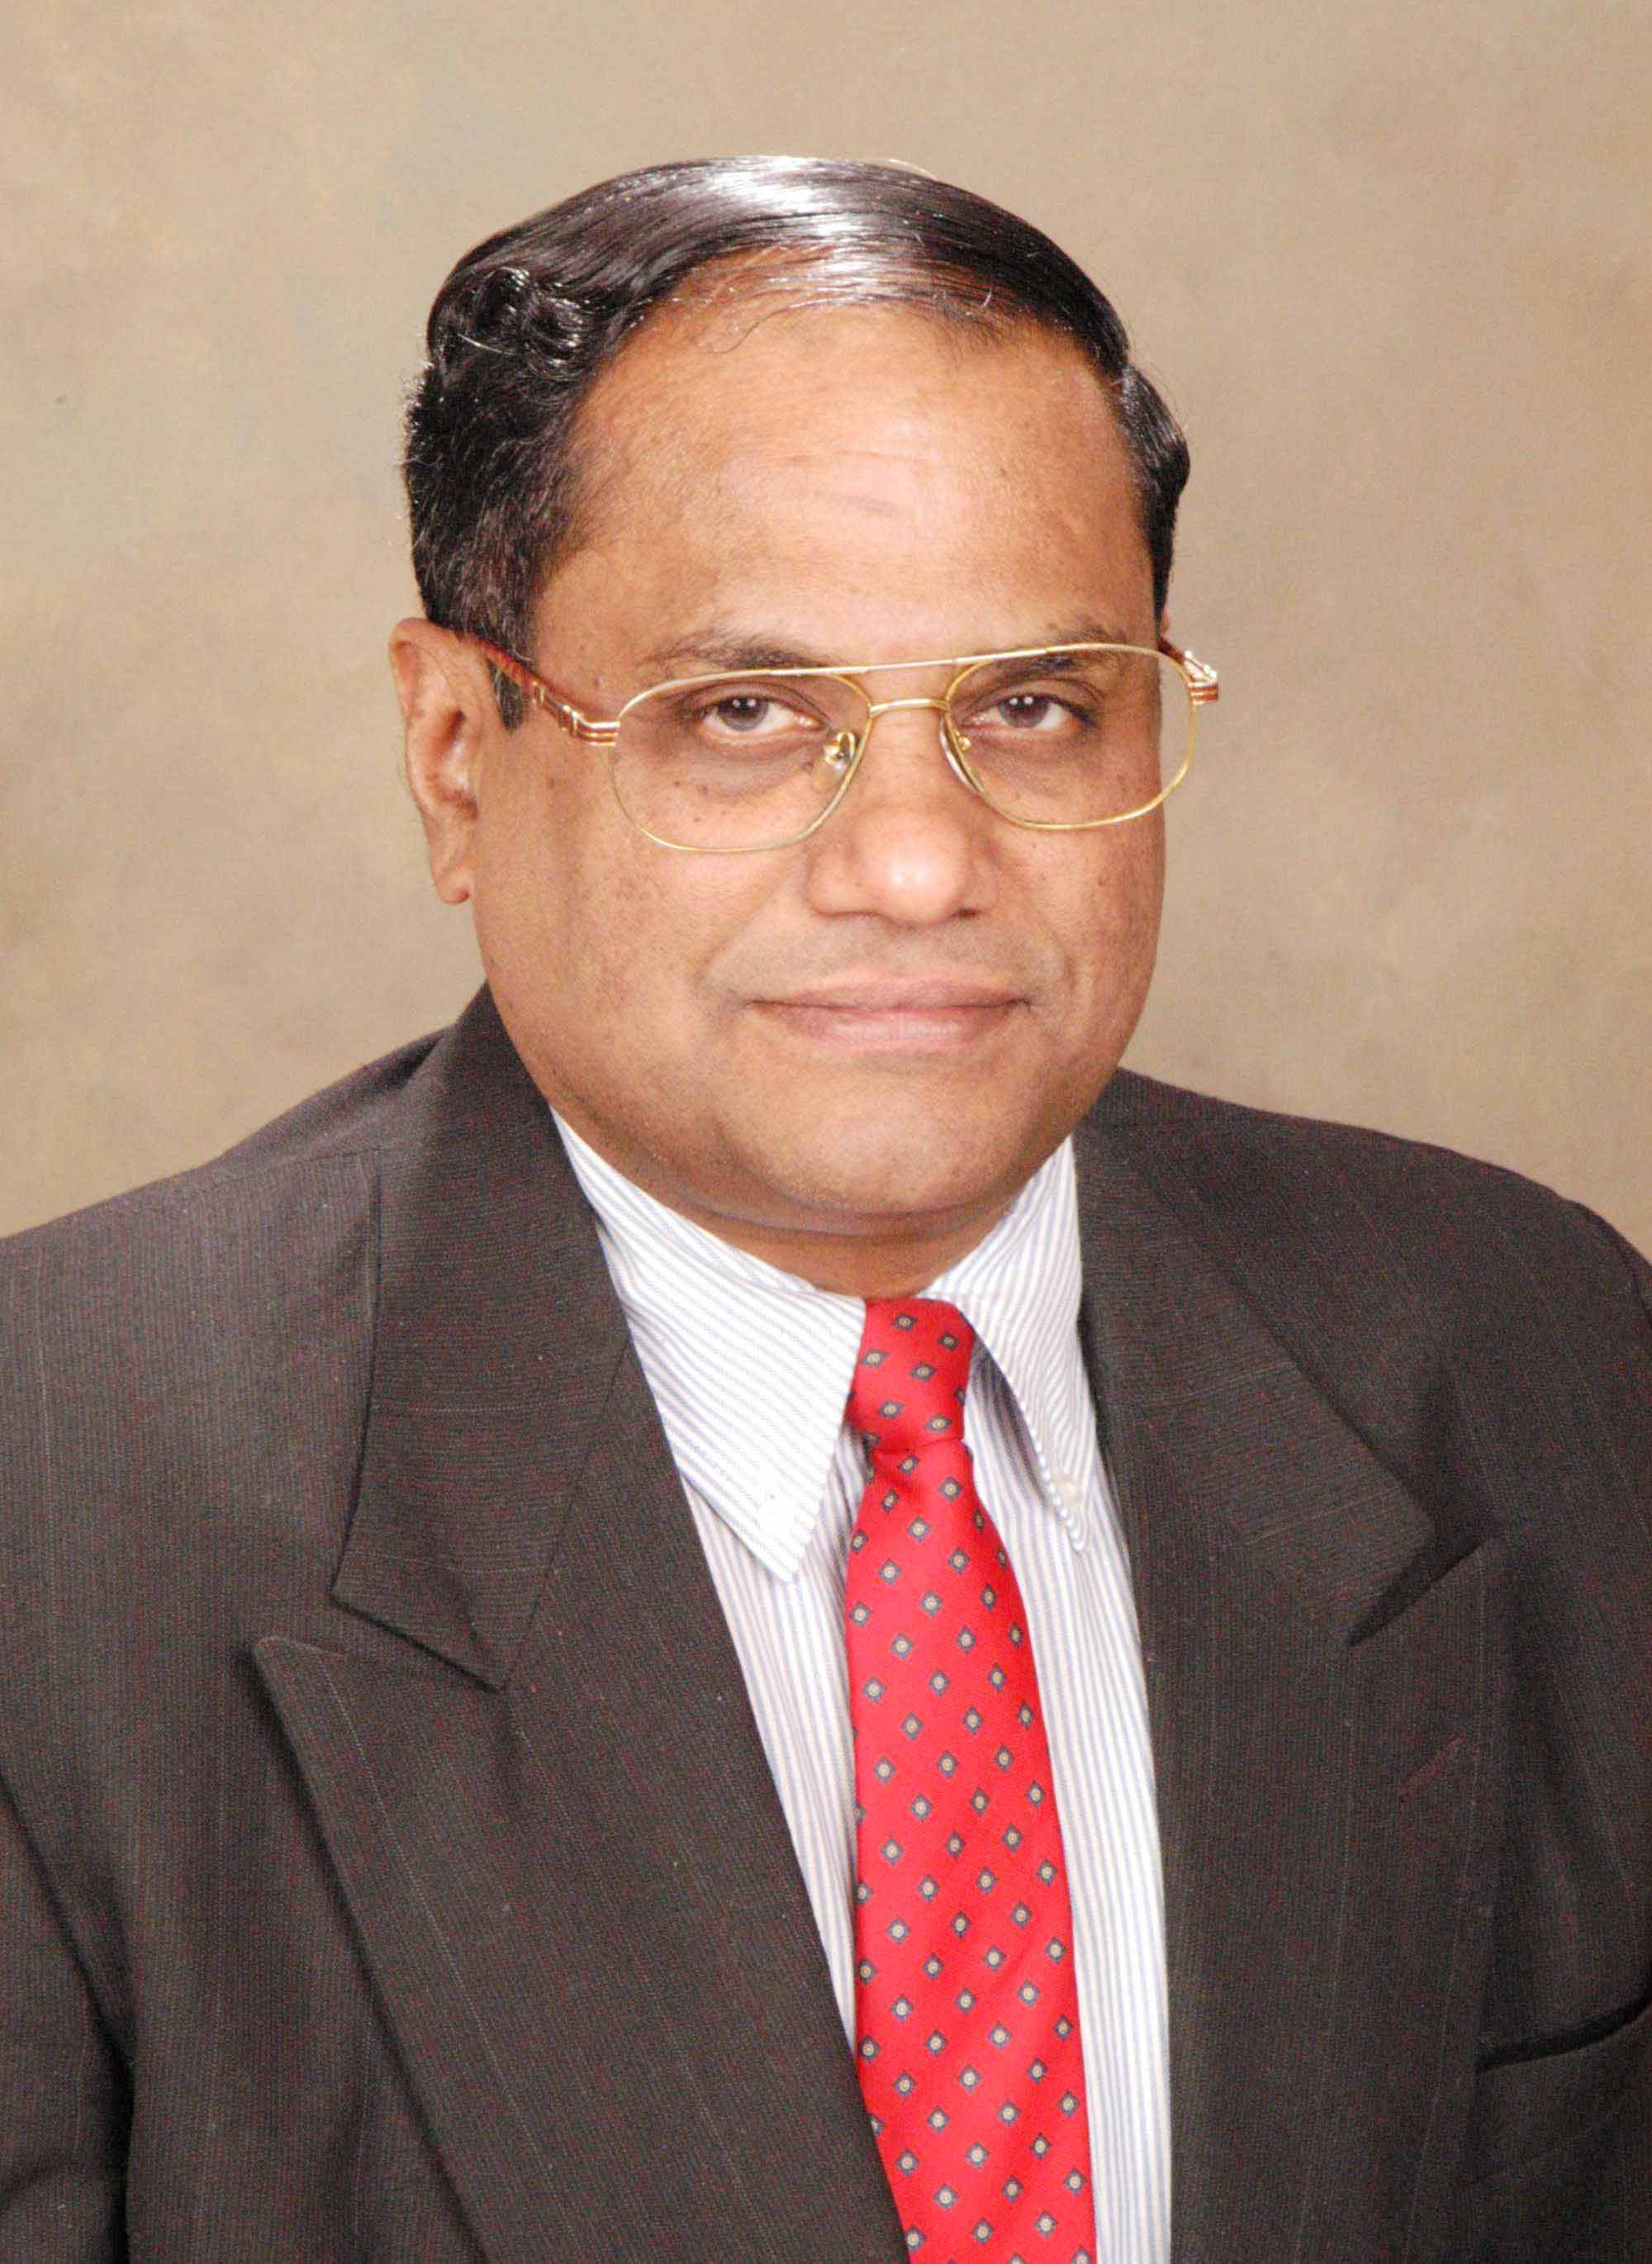 Dr. Thomas Abraham